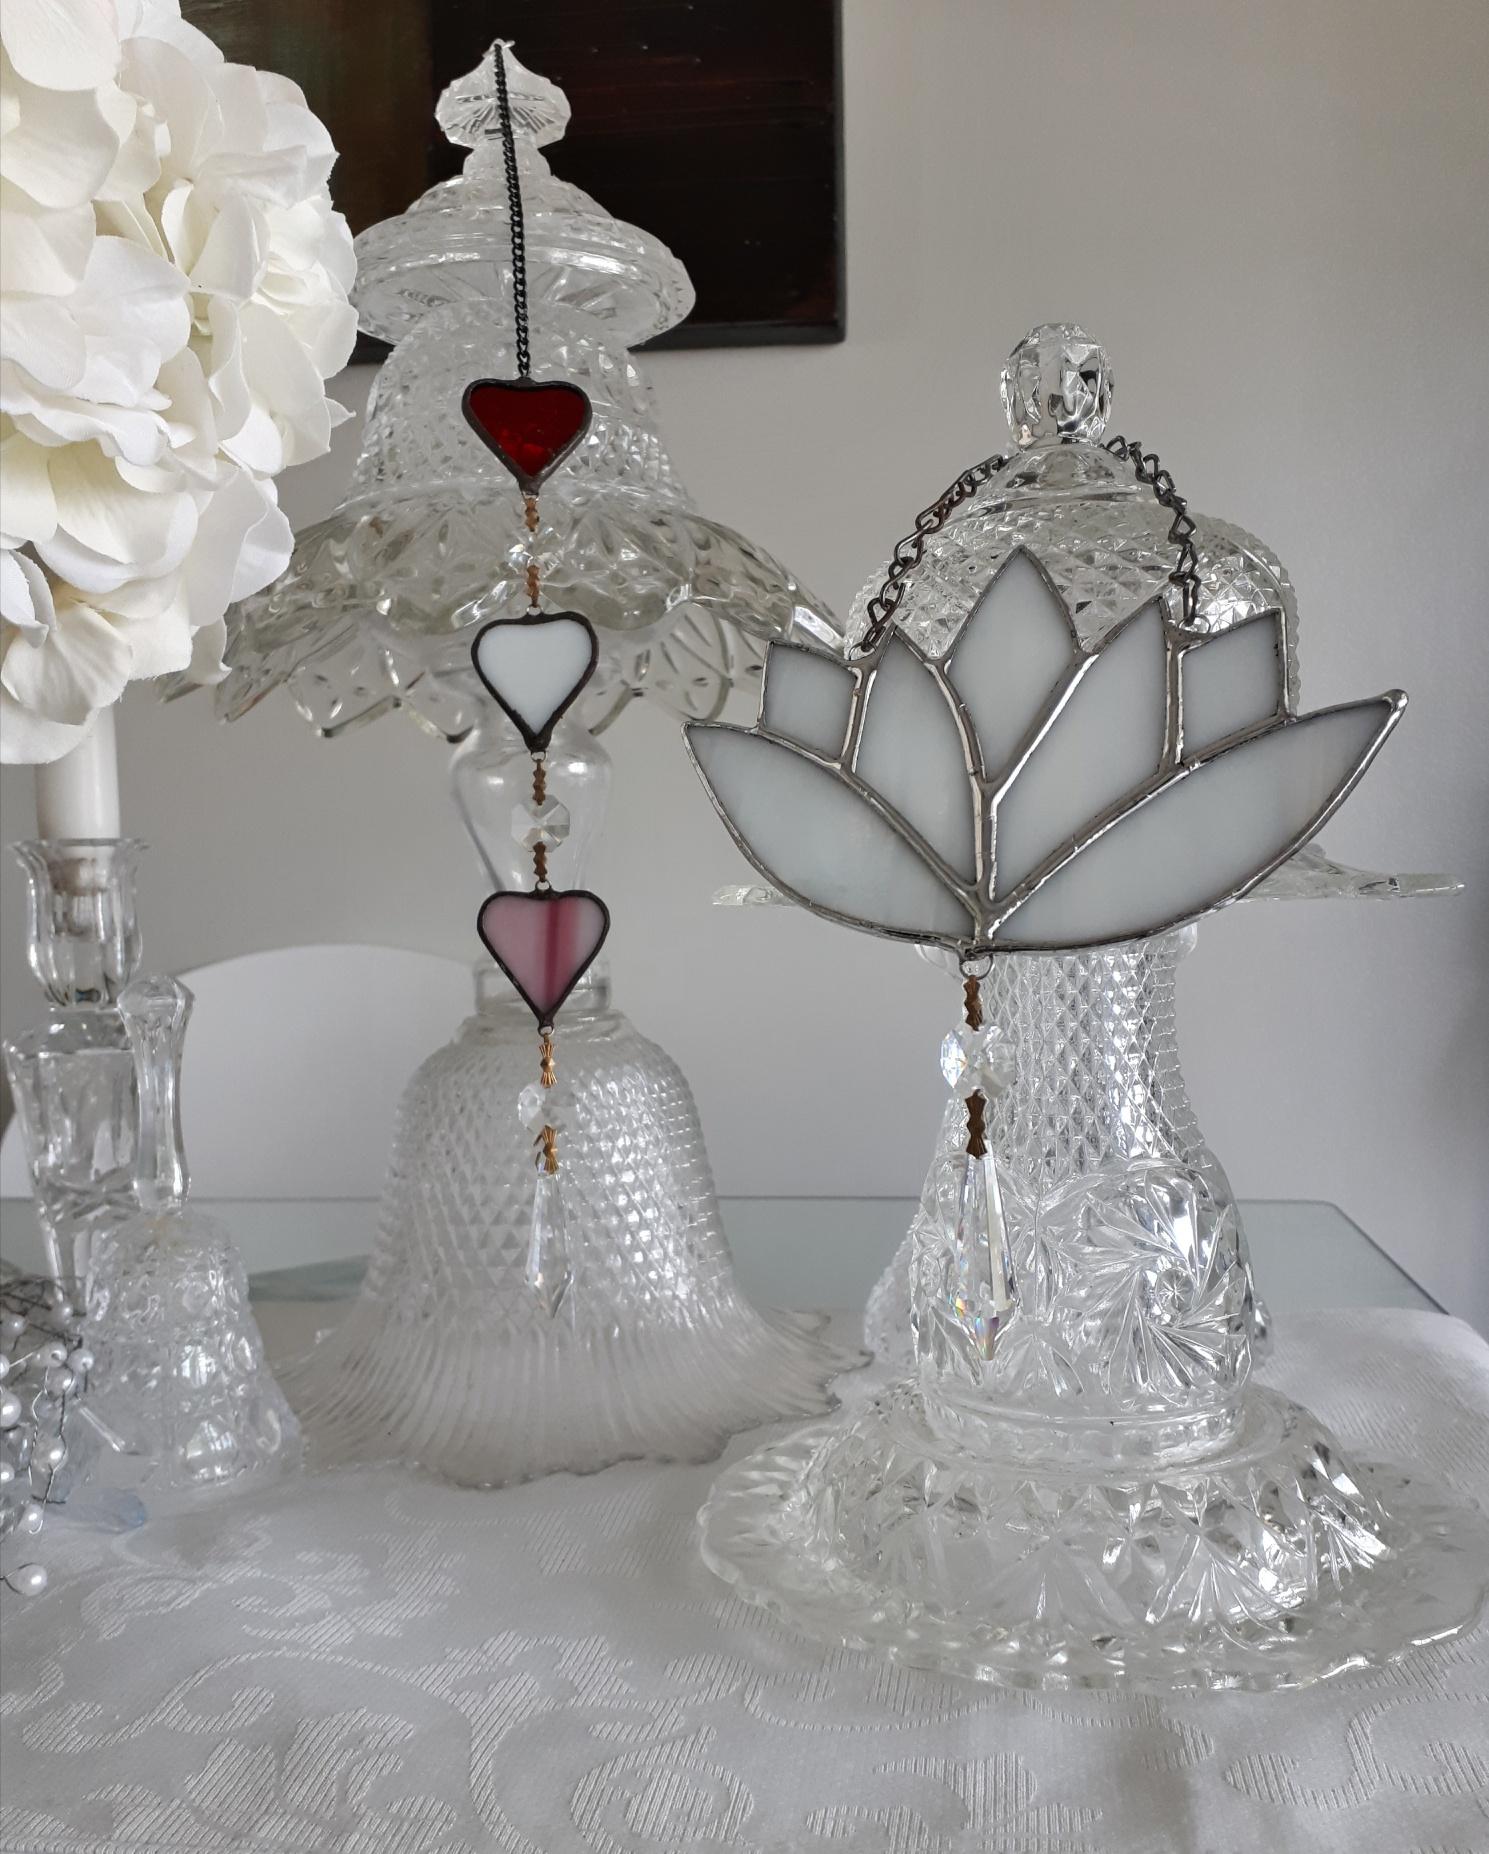 lotusandheartonglass